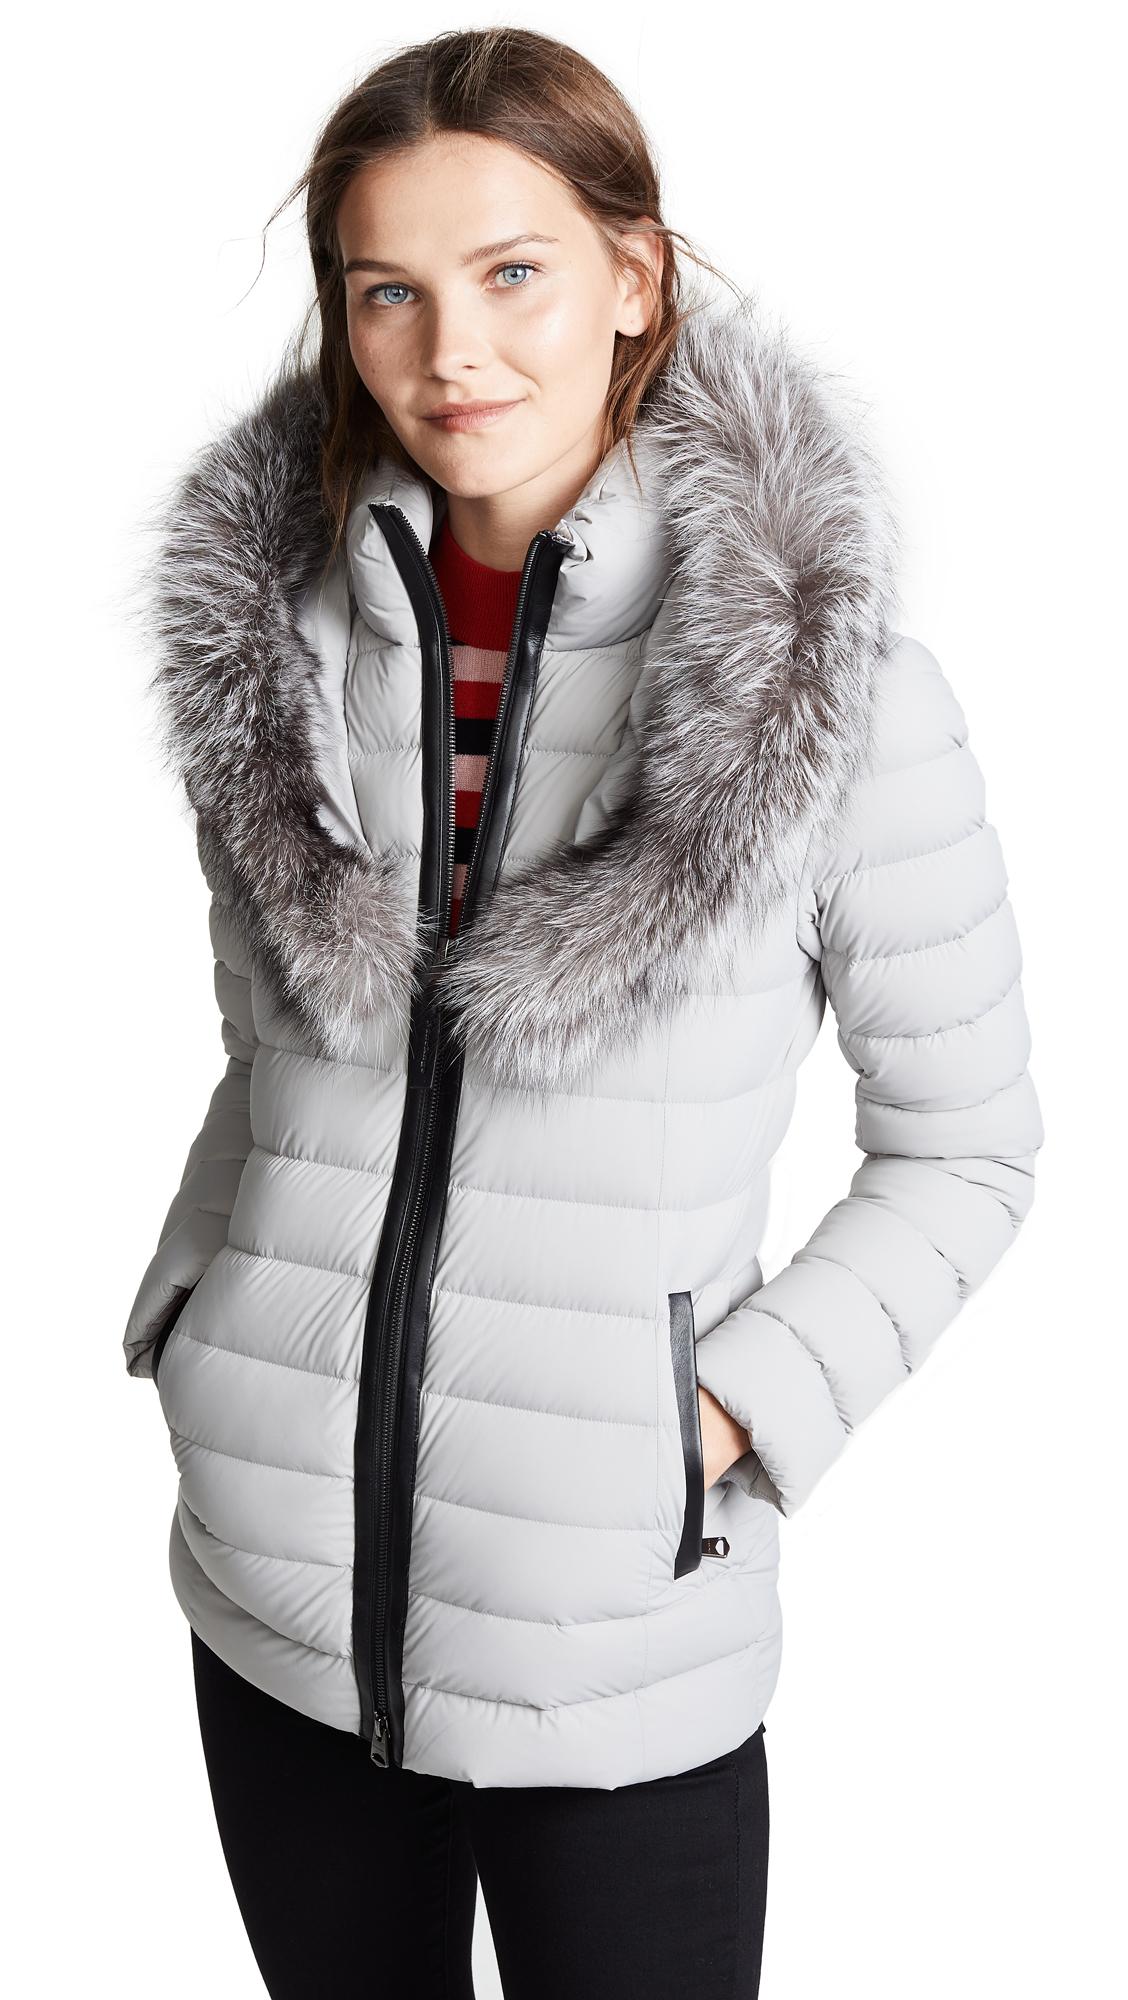 Photo of Mackage Kadalina Parka - buy Mackage jackets online